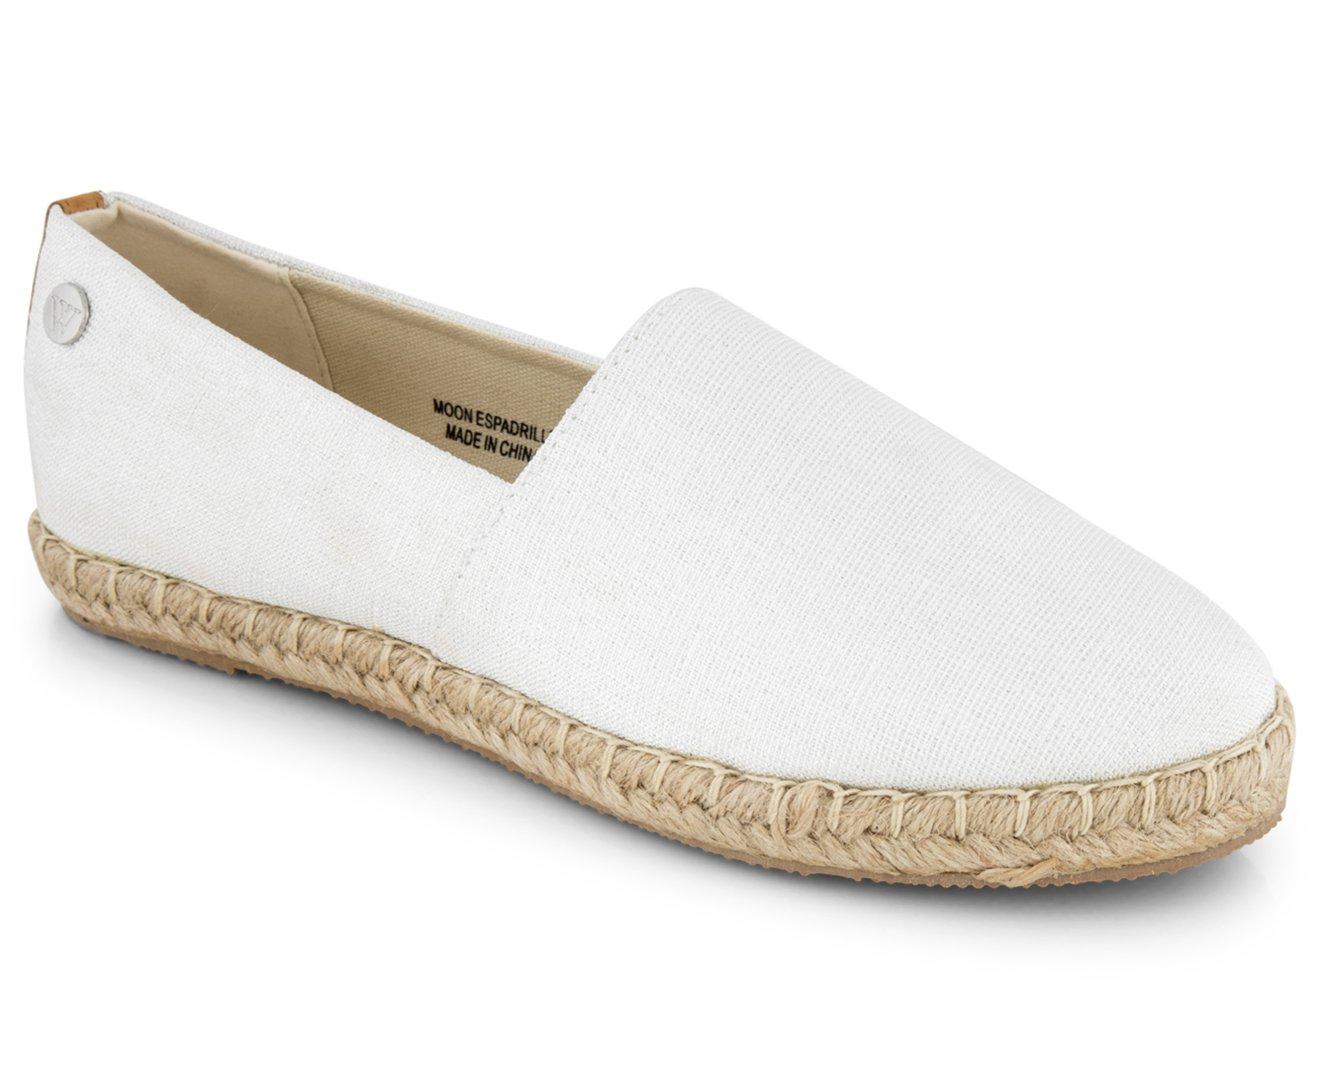 e707883a Walnut Melbourne Women's Moon Espadrille Shoe Lurex White: Amazon.com.au:  Fashion